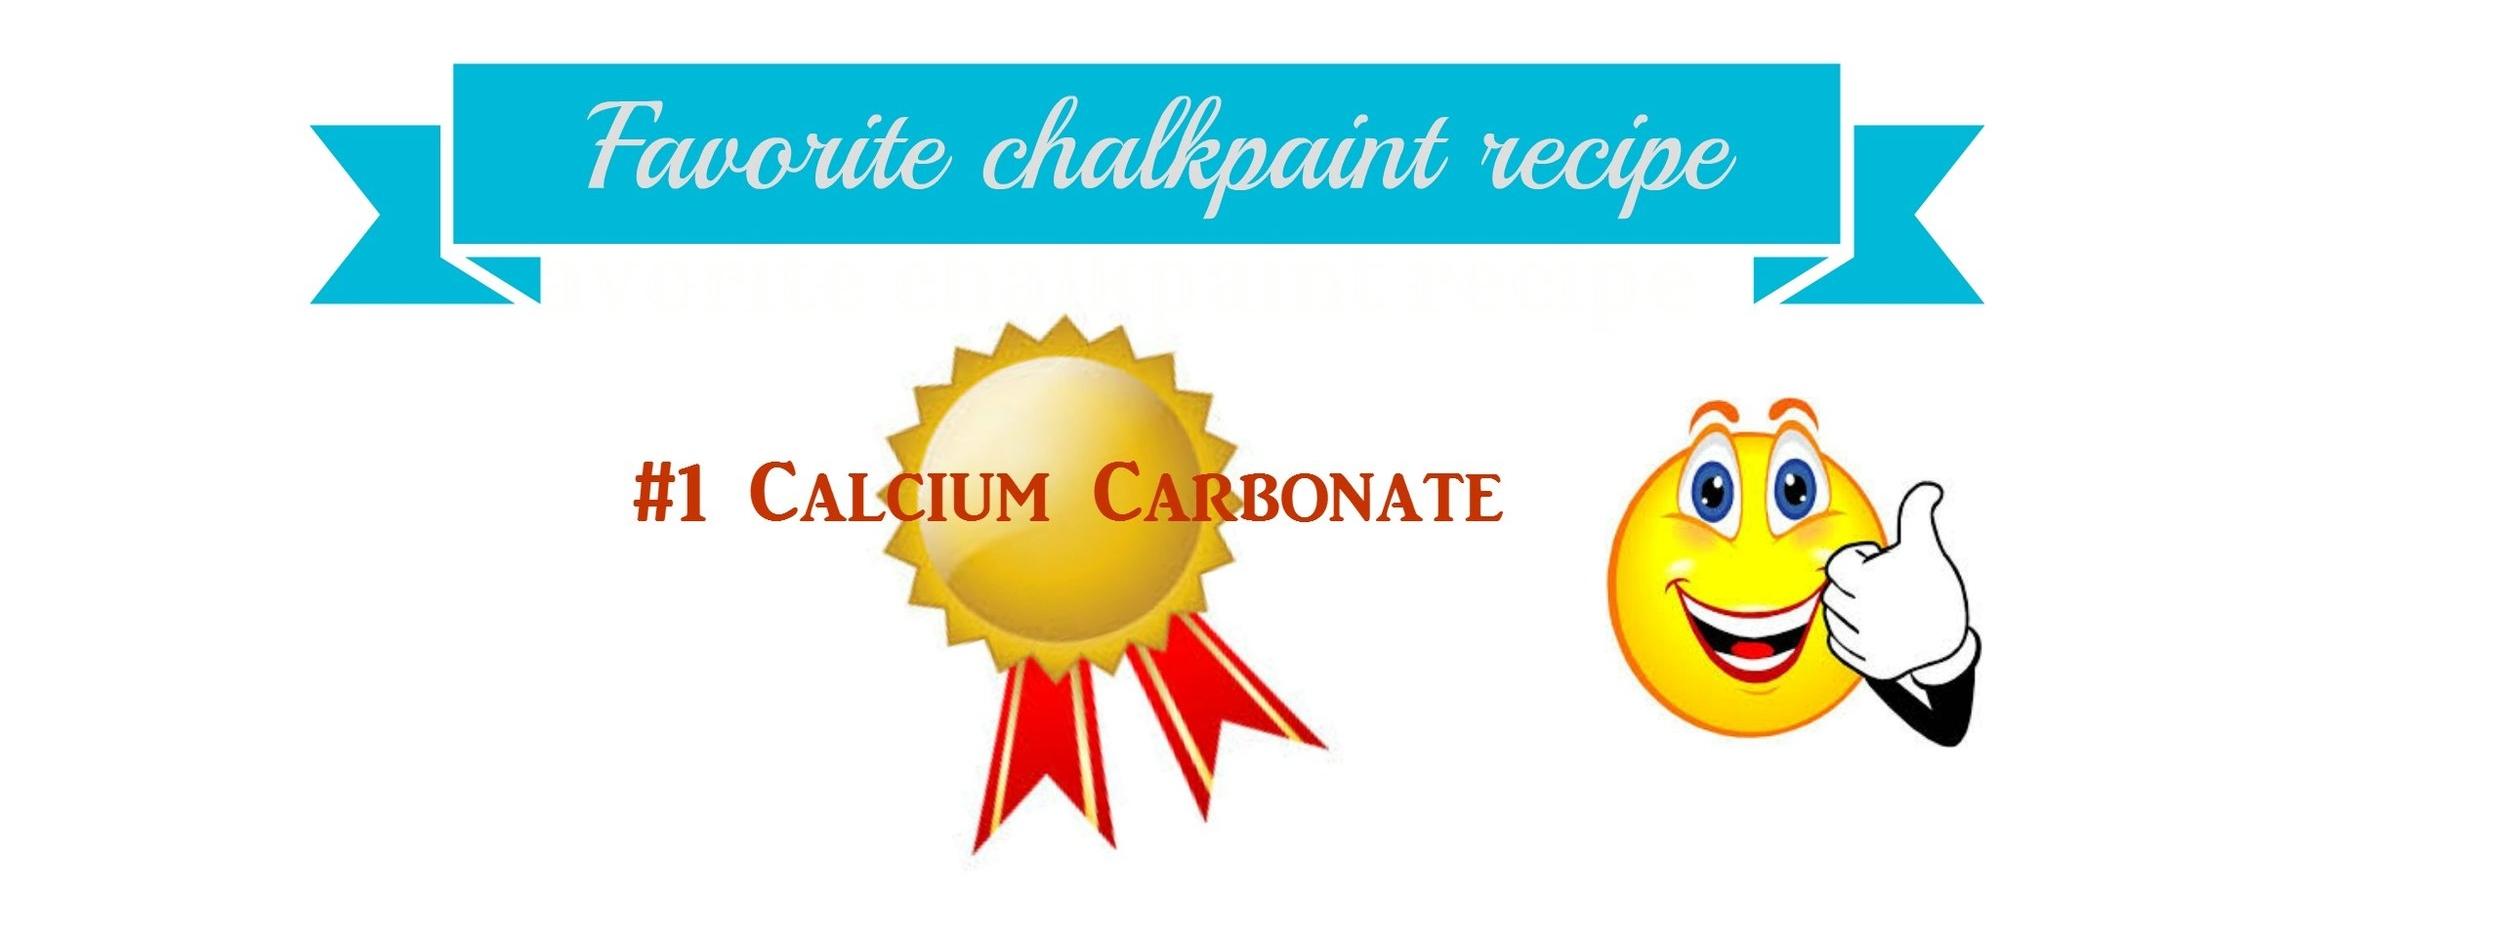 best chalkpaint recipe